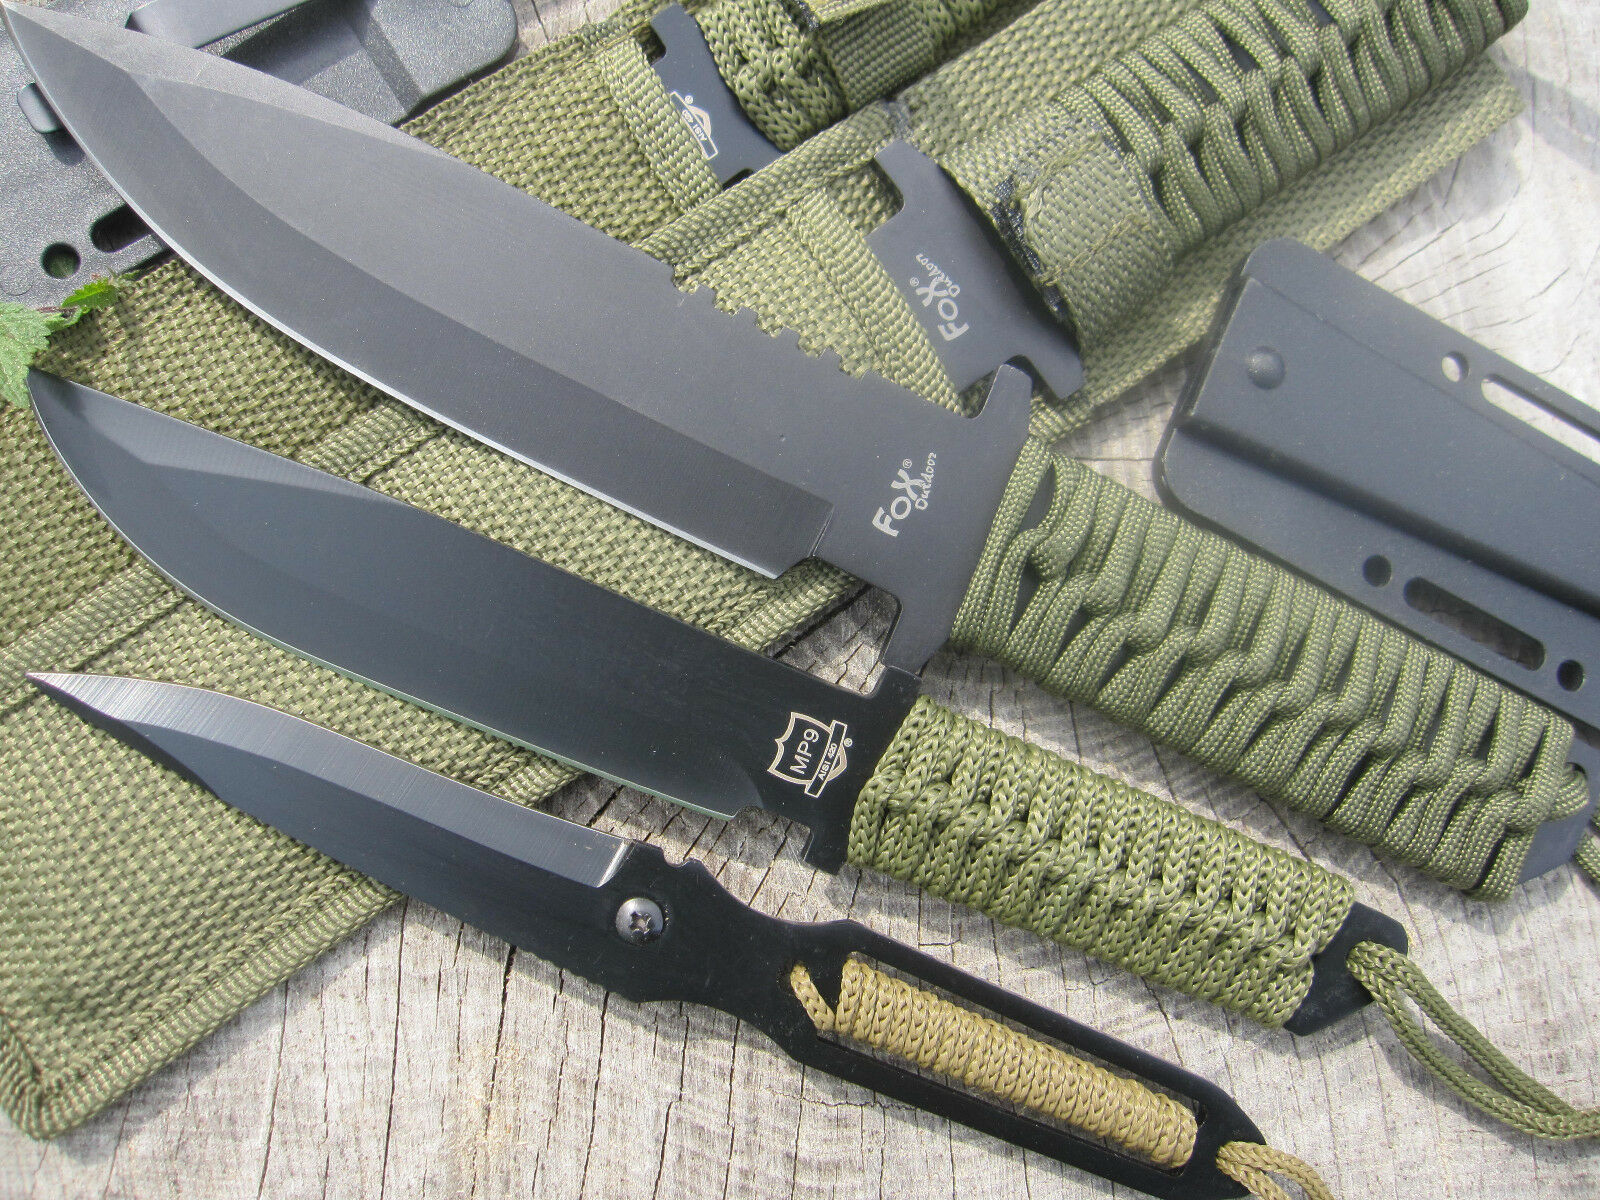 3 Messer BW Outdoorset Edelstahl Paracord Gürtelmesser Neck Knife Halsmesser